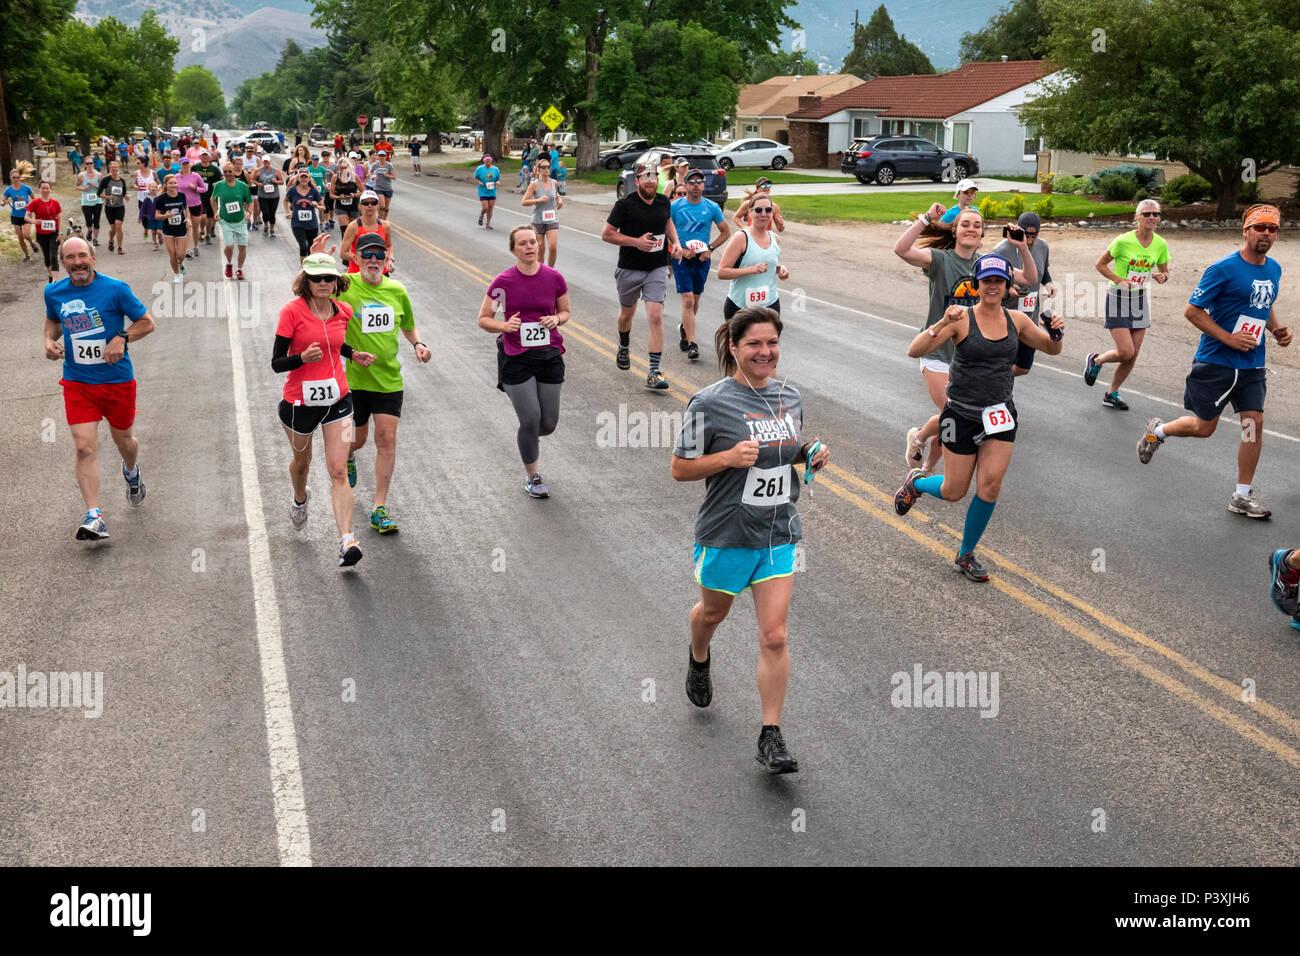 Runners in 5K & 10K foot races; annual Fibark festival; Salida; Colorado; USA - Stock Image